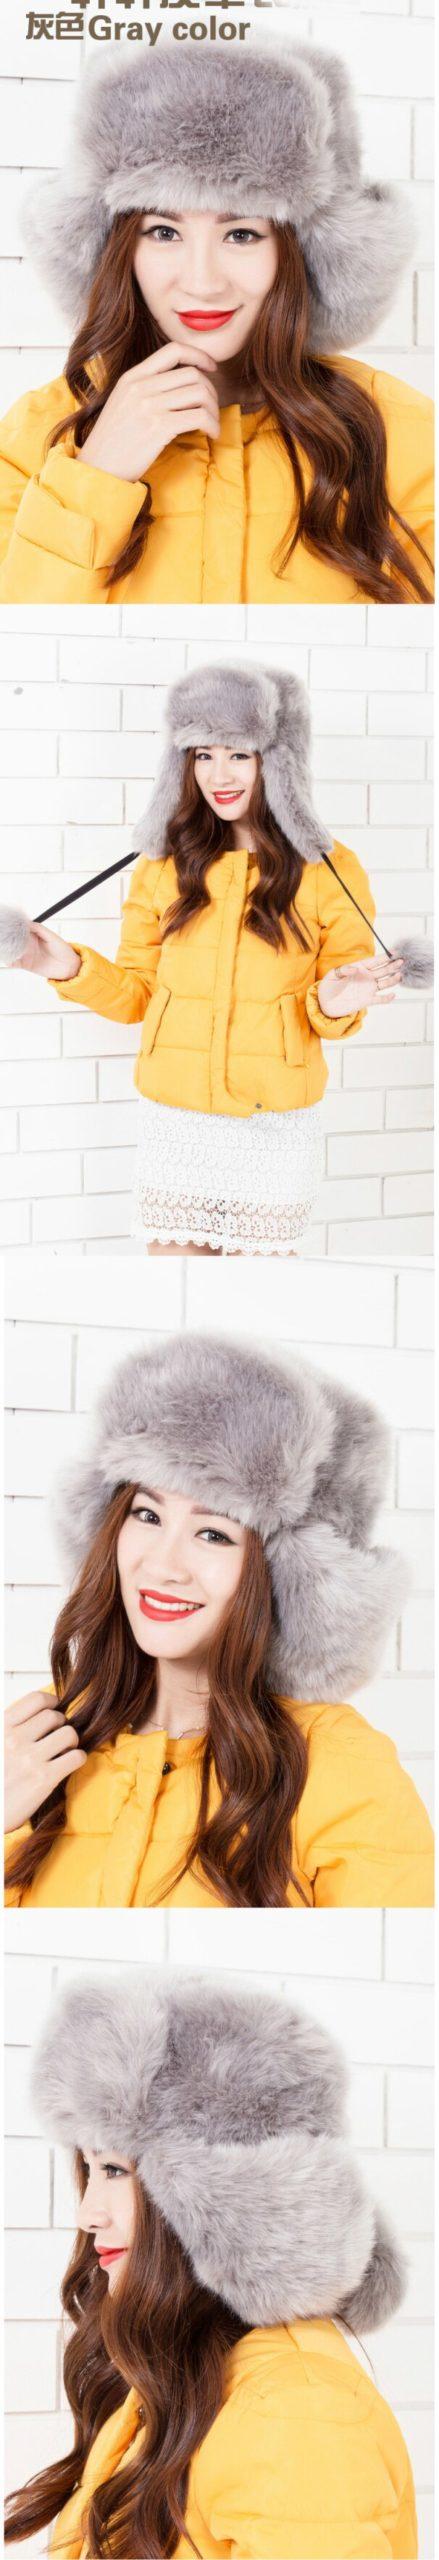 MZ248 Women Winter Hat Solid Black Grey White Ladies Bomber Hats Caps Warm Russian Ushanka Hats Rabbit Fur Hats for Women